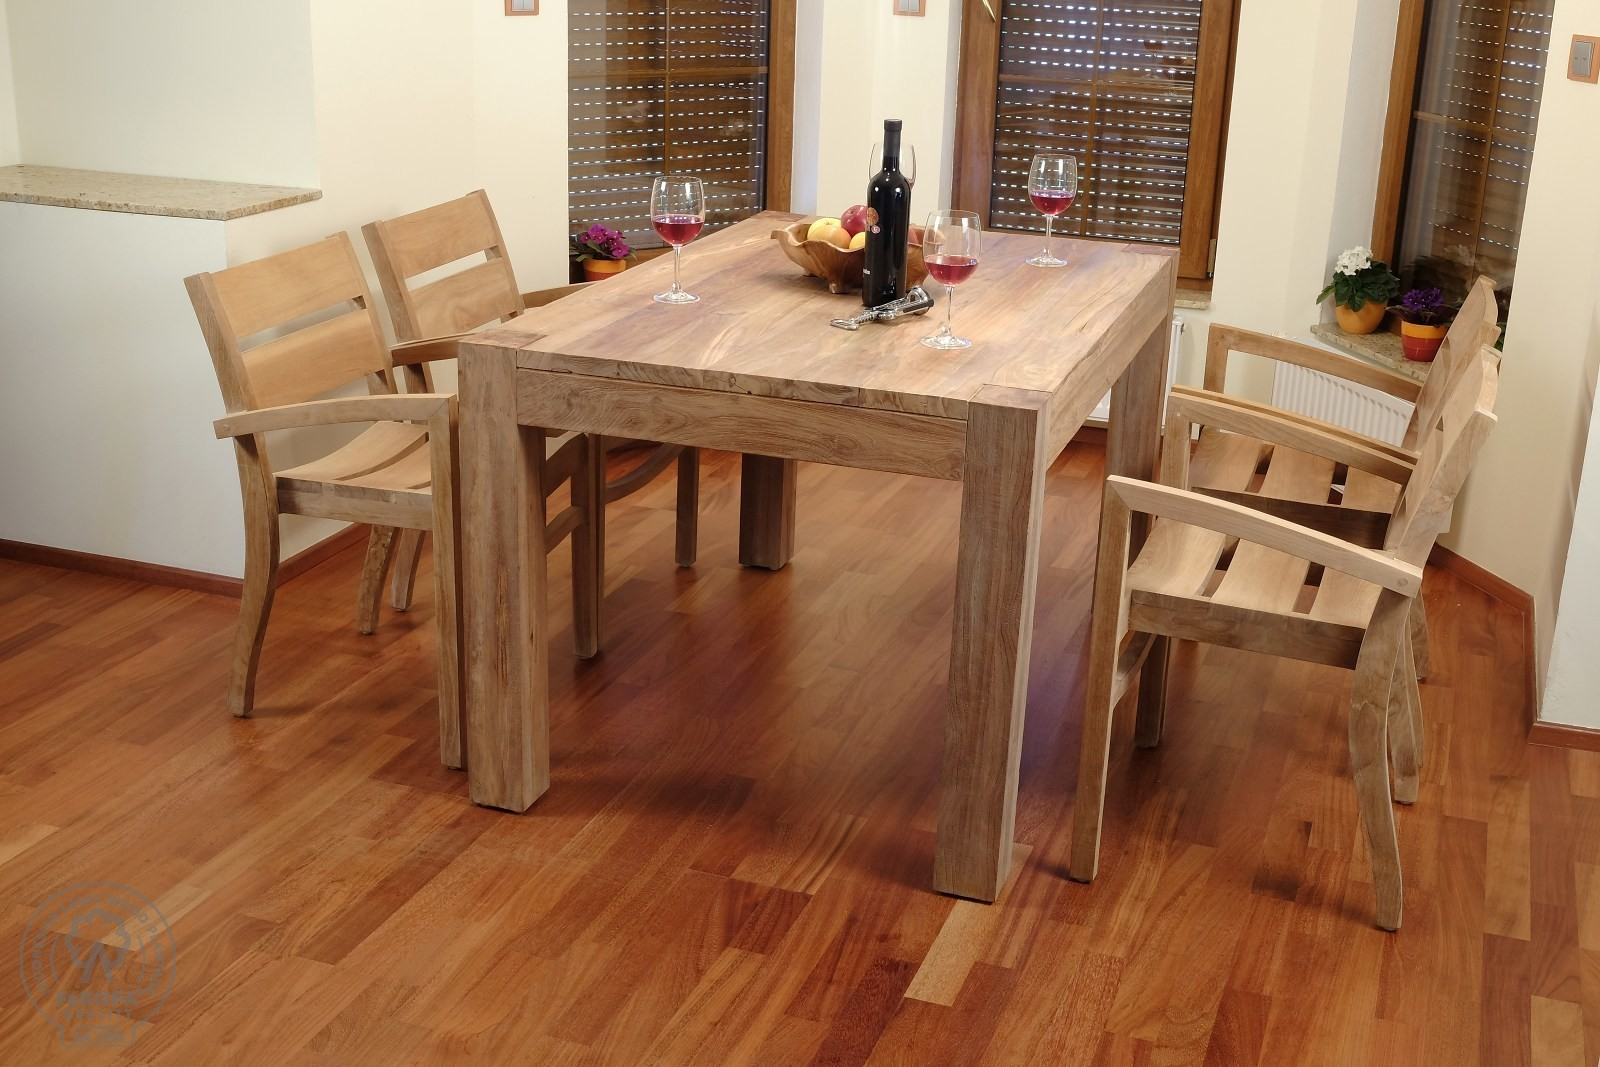 Súprava jedálenského nábytku z teakového dreva